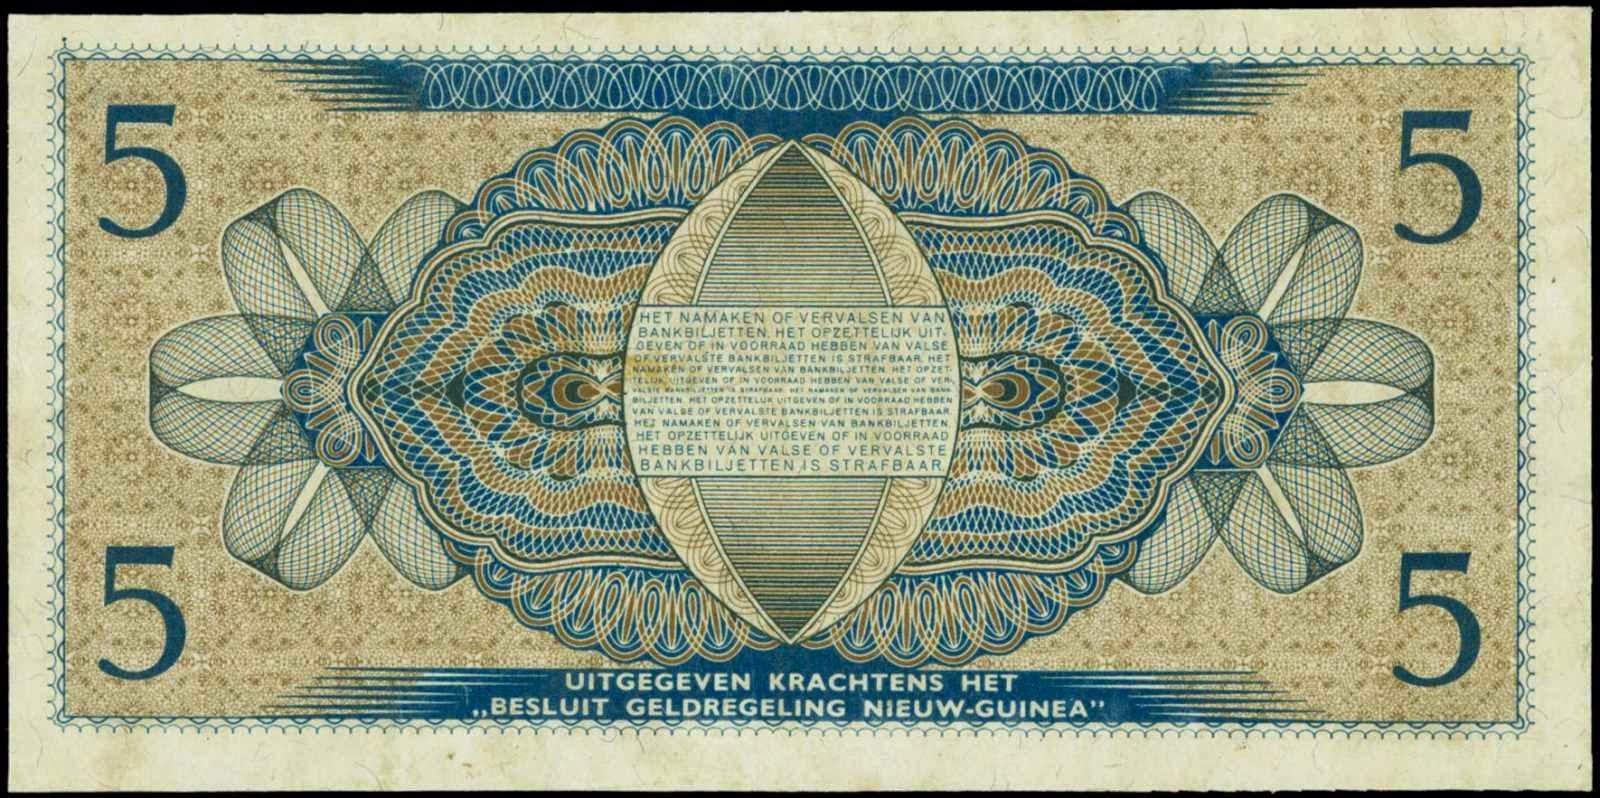 Netherlands New Guinea paper money 5 Gulden bank note 1950